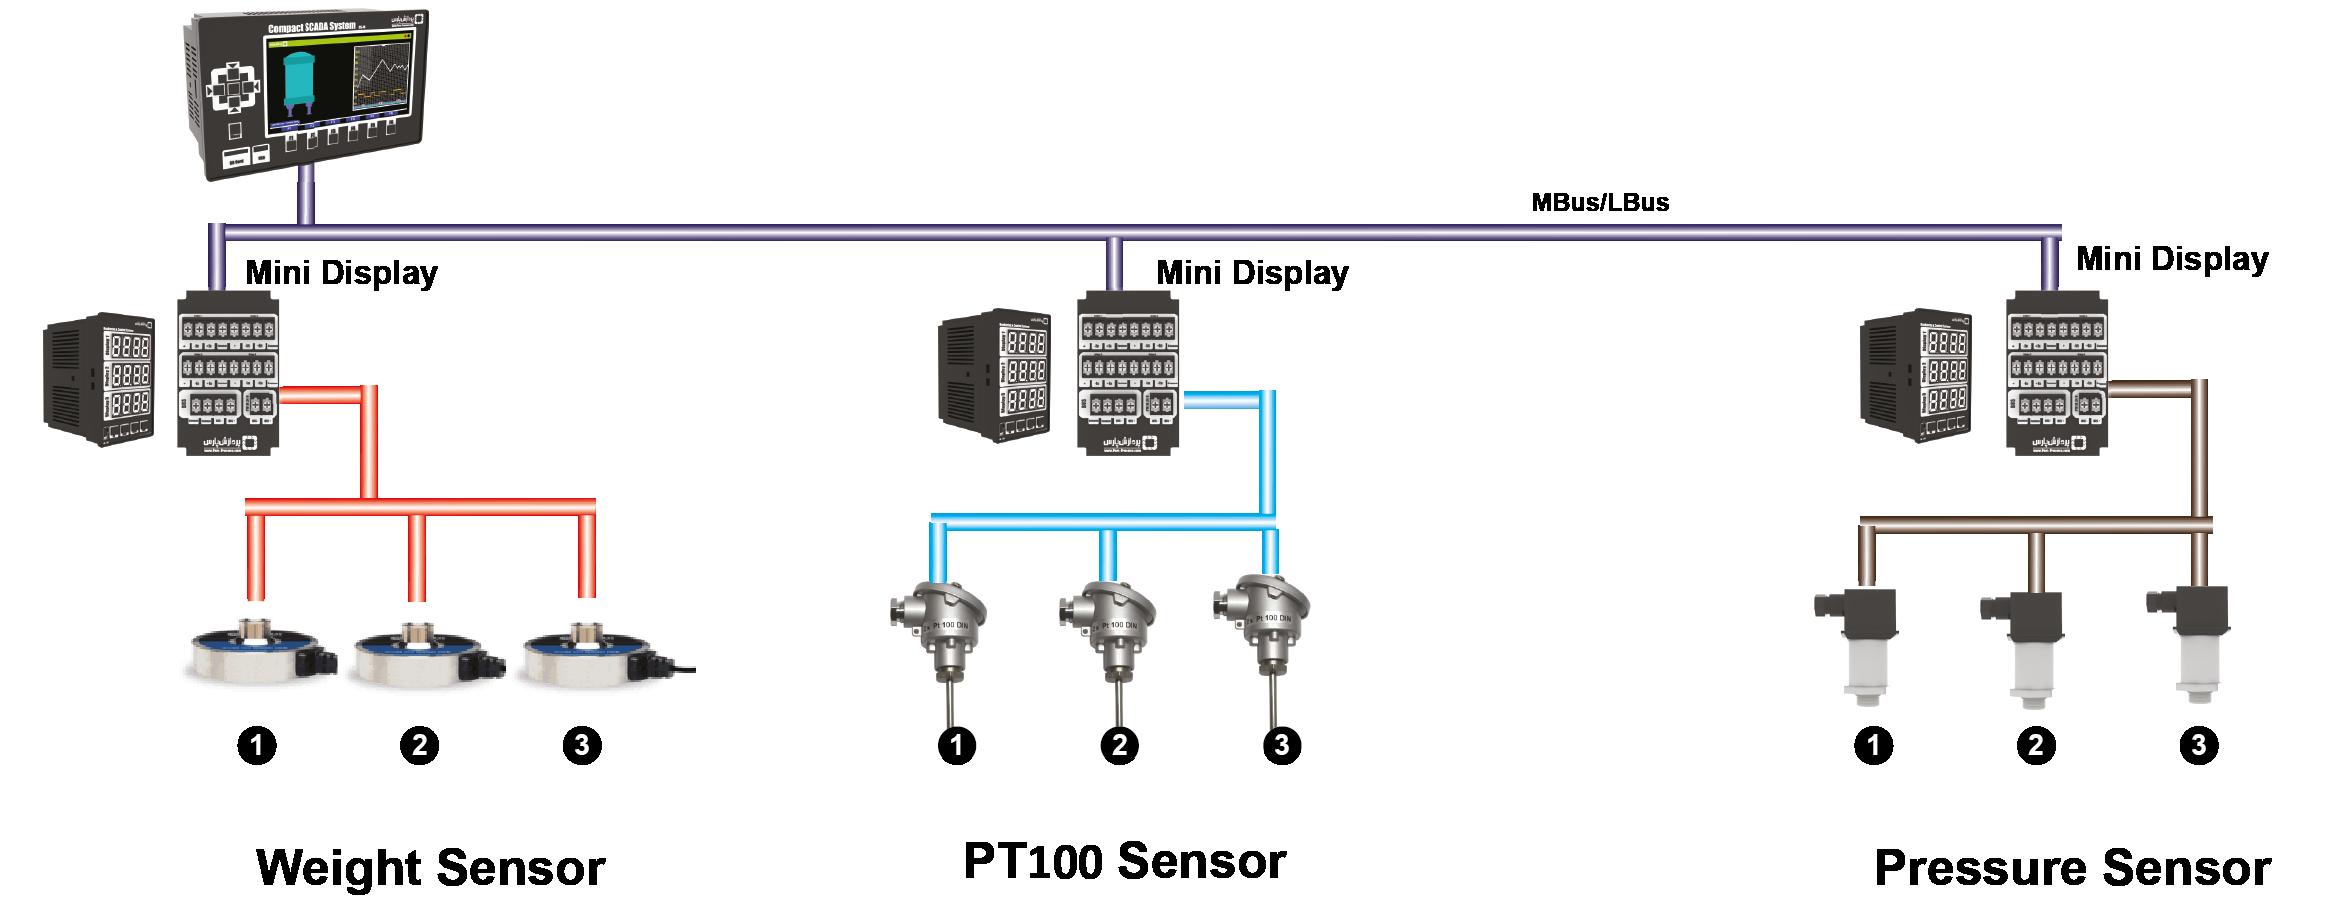 Mini Display Pars Process 7 Segment Block Diagram